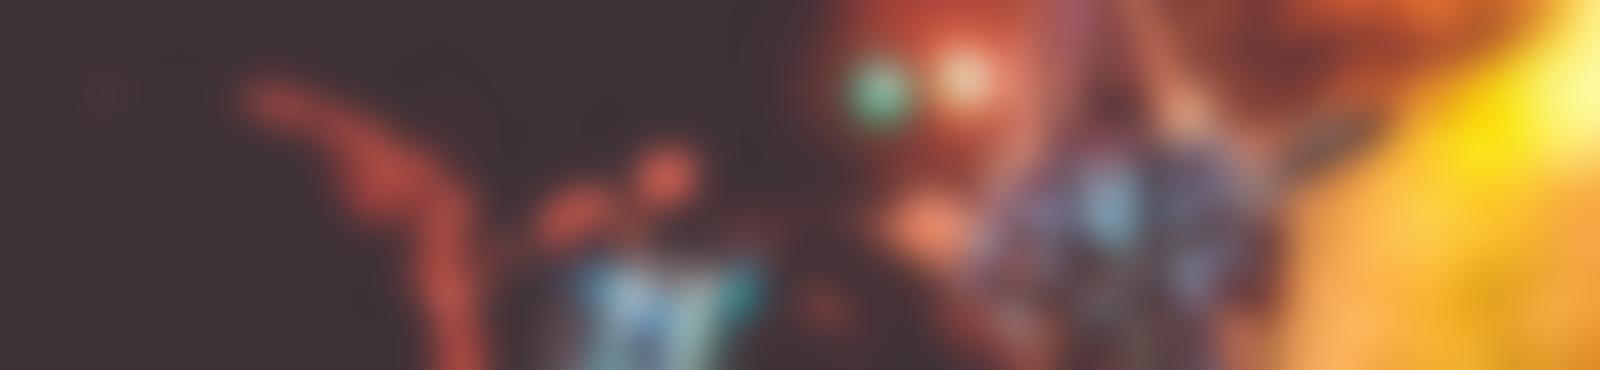 Blurred 492517e4 2f6d 4651 90cb 5ee4b5772065